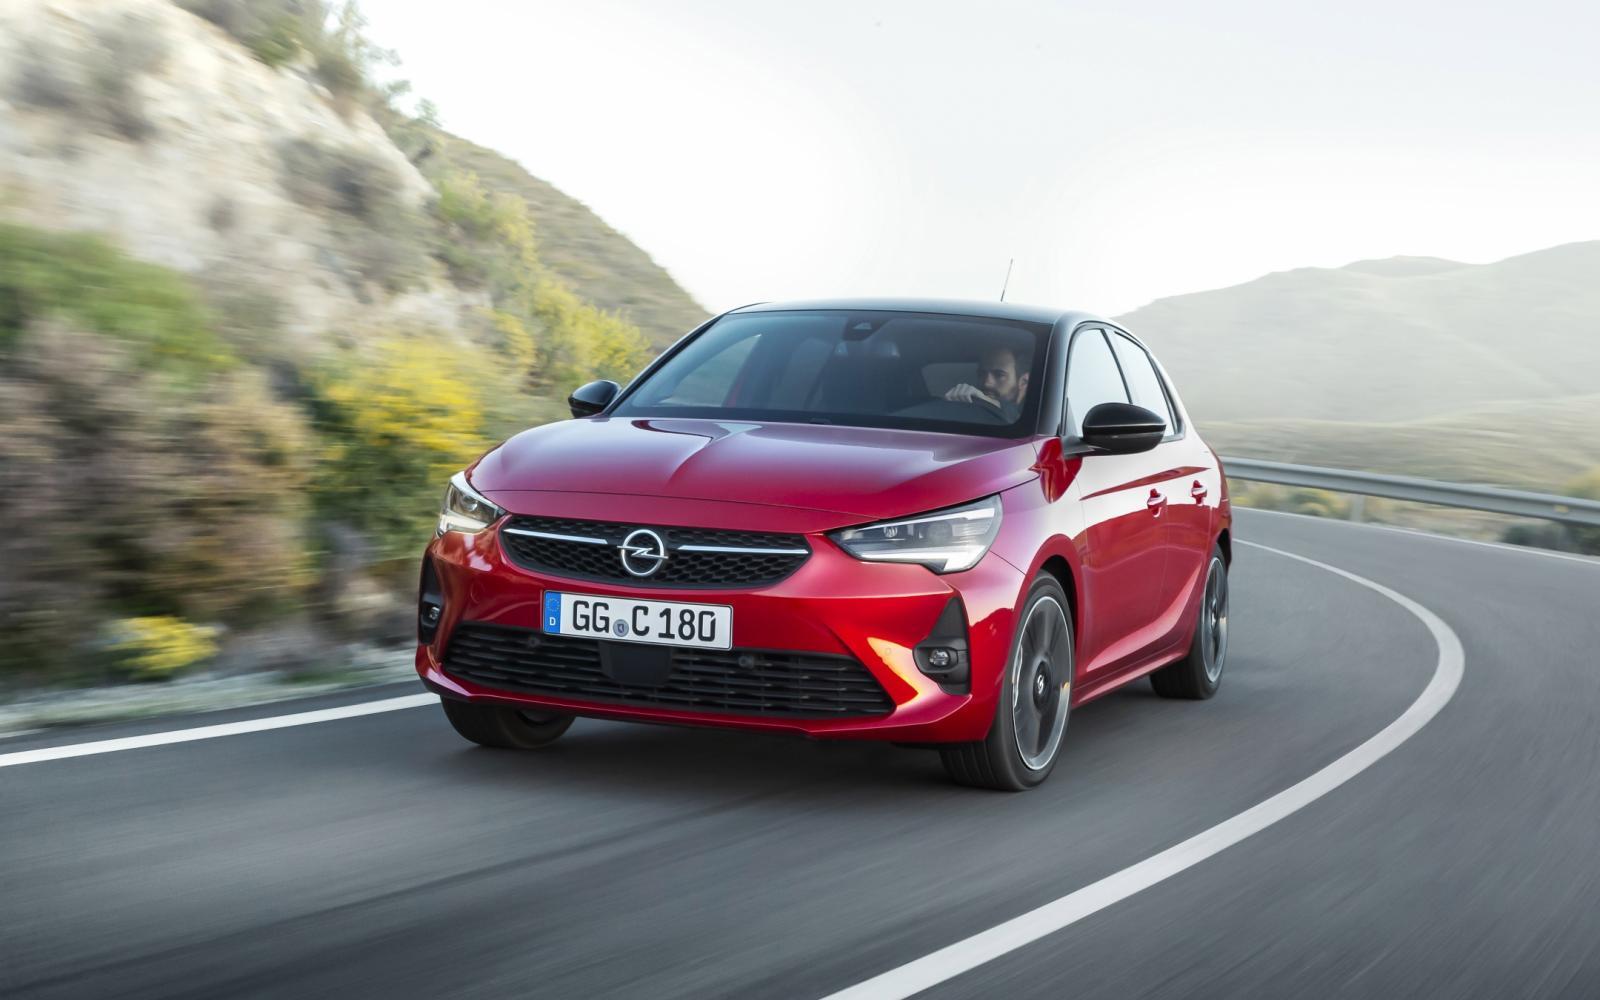 Prijzen Opel Corsa bekendgemaakt